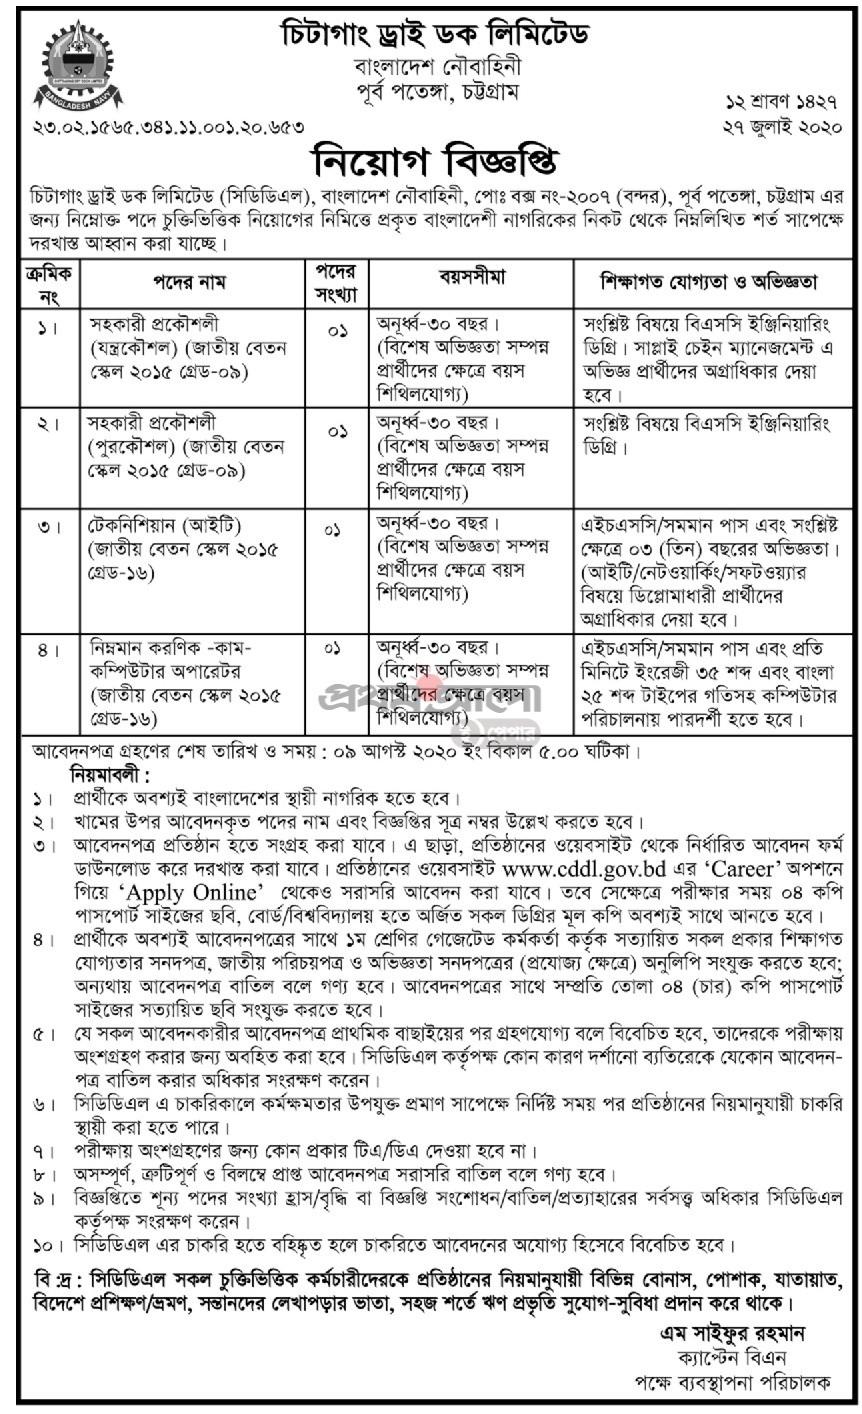 Chittagong Dry Dock Limited Job Circular 2020